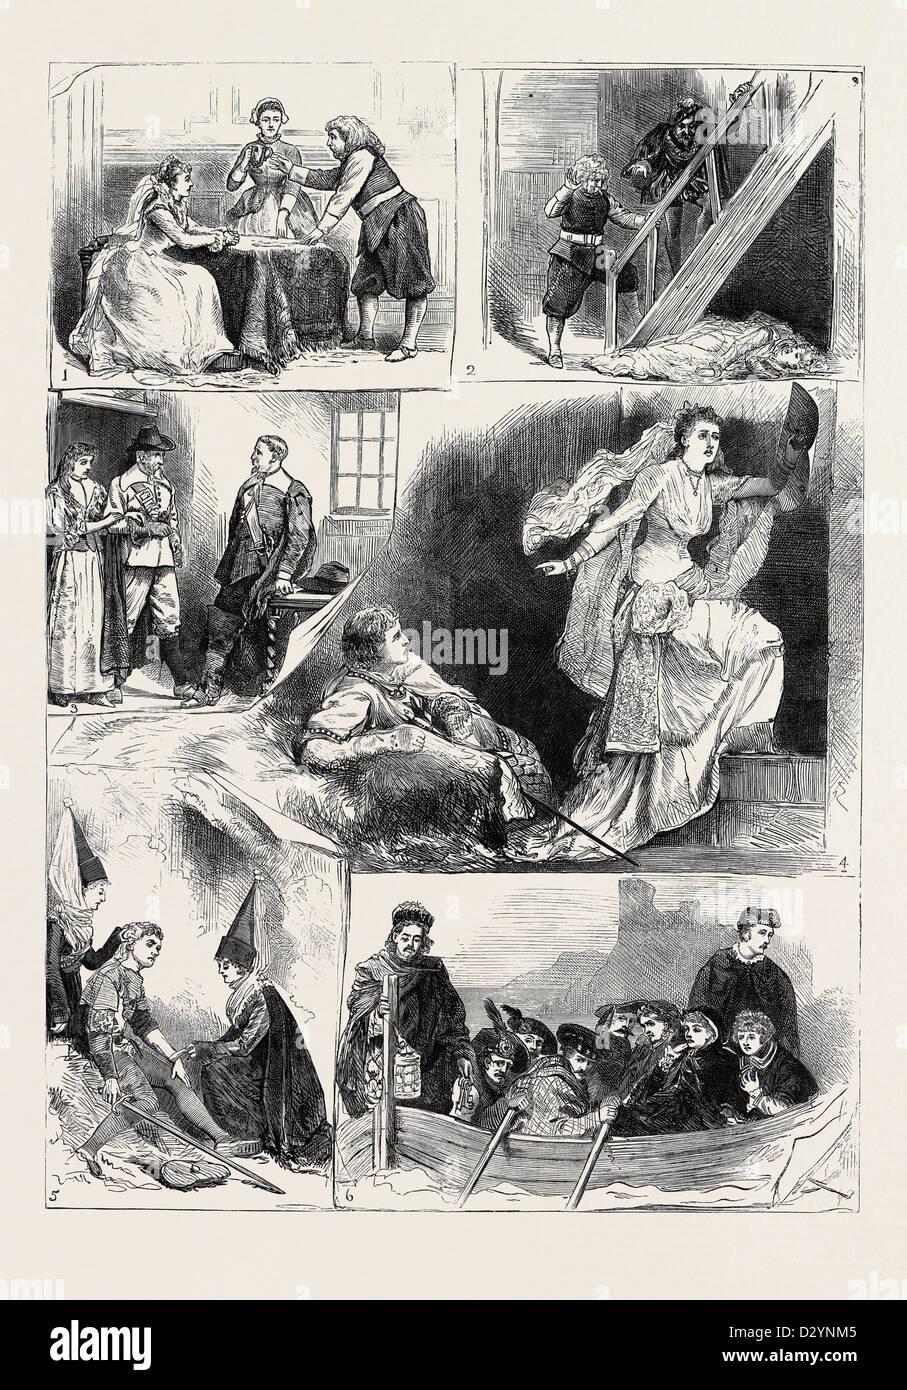 TABLEAUX VIVANTS FROM SIR WALTER SCOTT'S NOVELS AT CROMWELL HOUSE SOUTH KENSINGTON LONDON - Stock Image